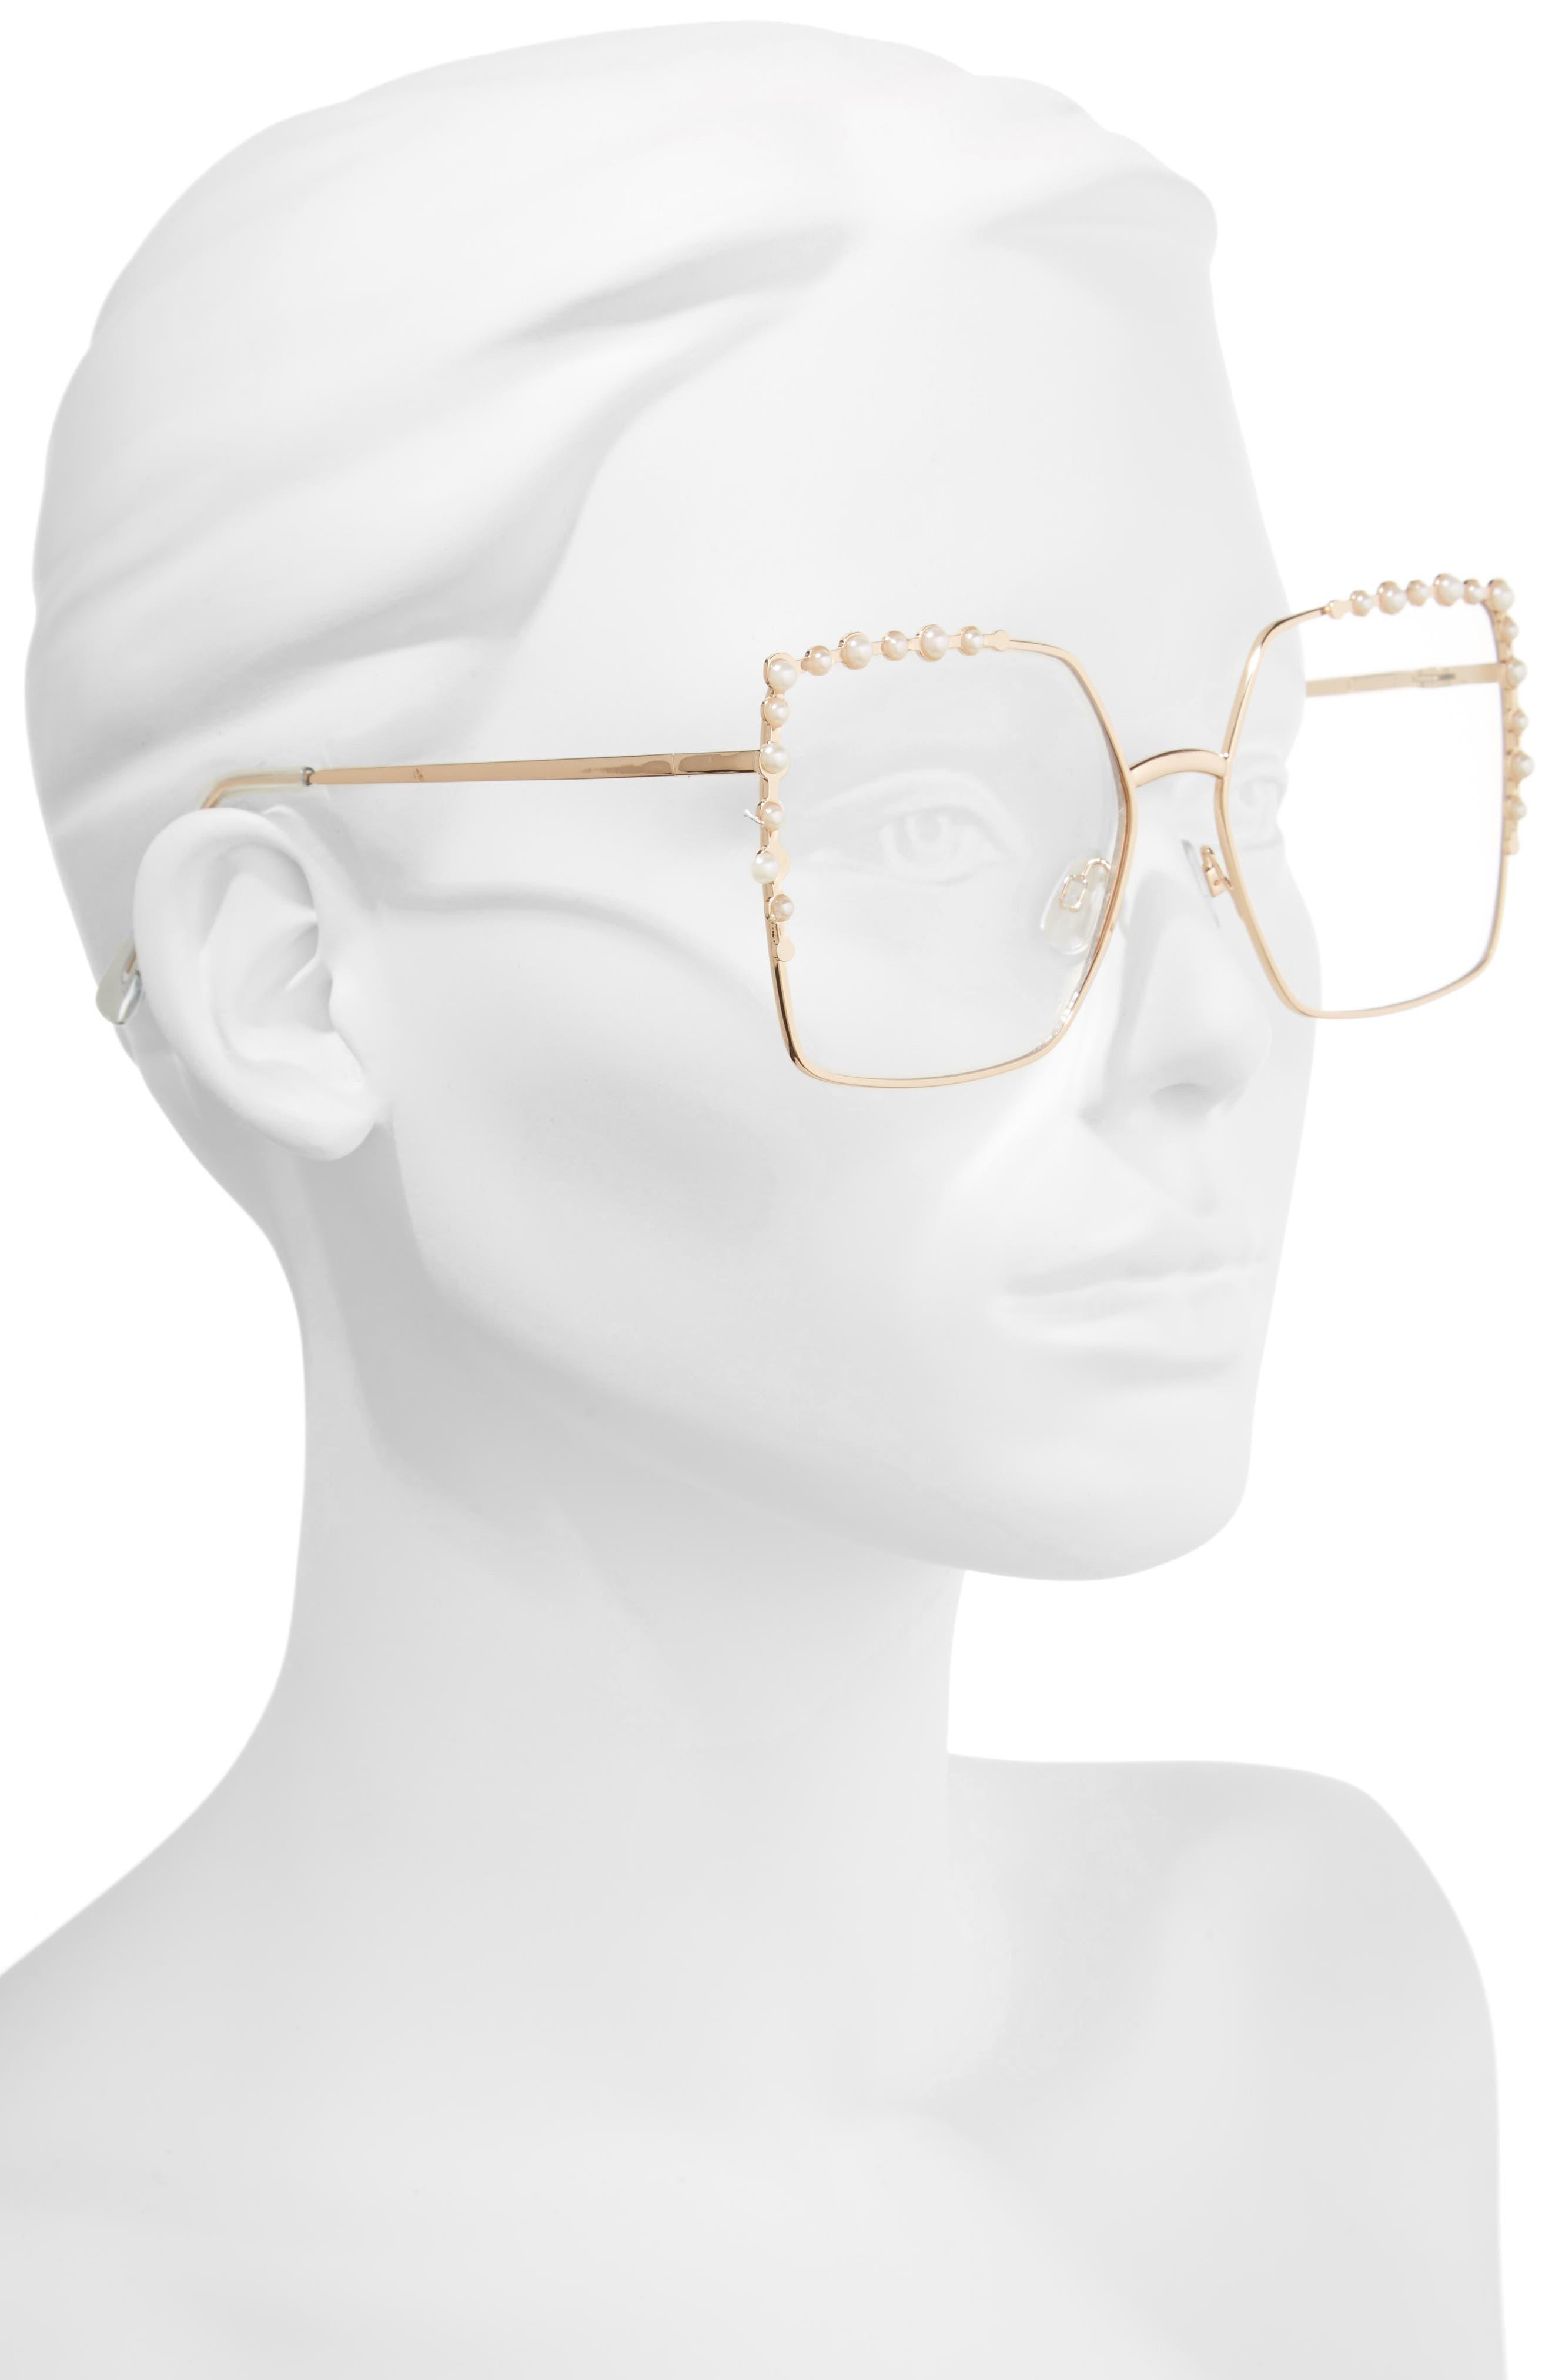 63mm Imitation Pearl Square Fashion Glasses,                             Alternate thumbnail 2, color,                             Gold/ Pearl